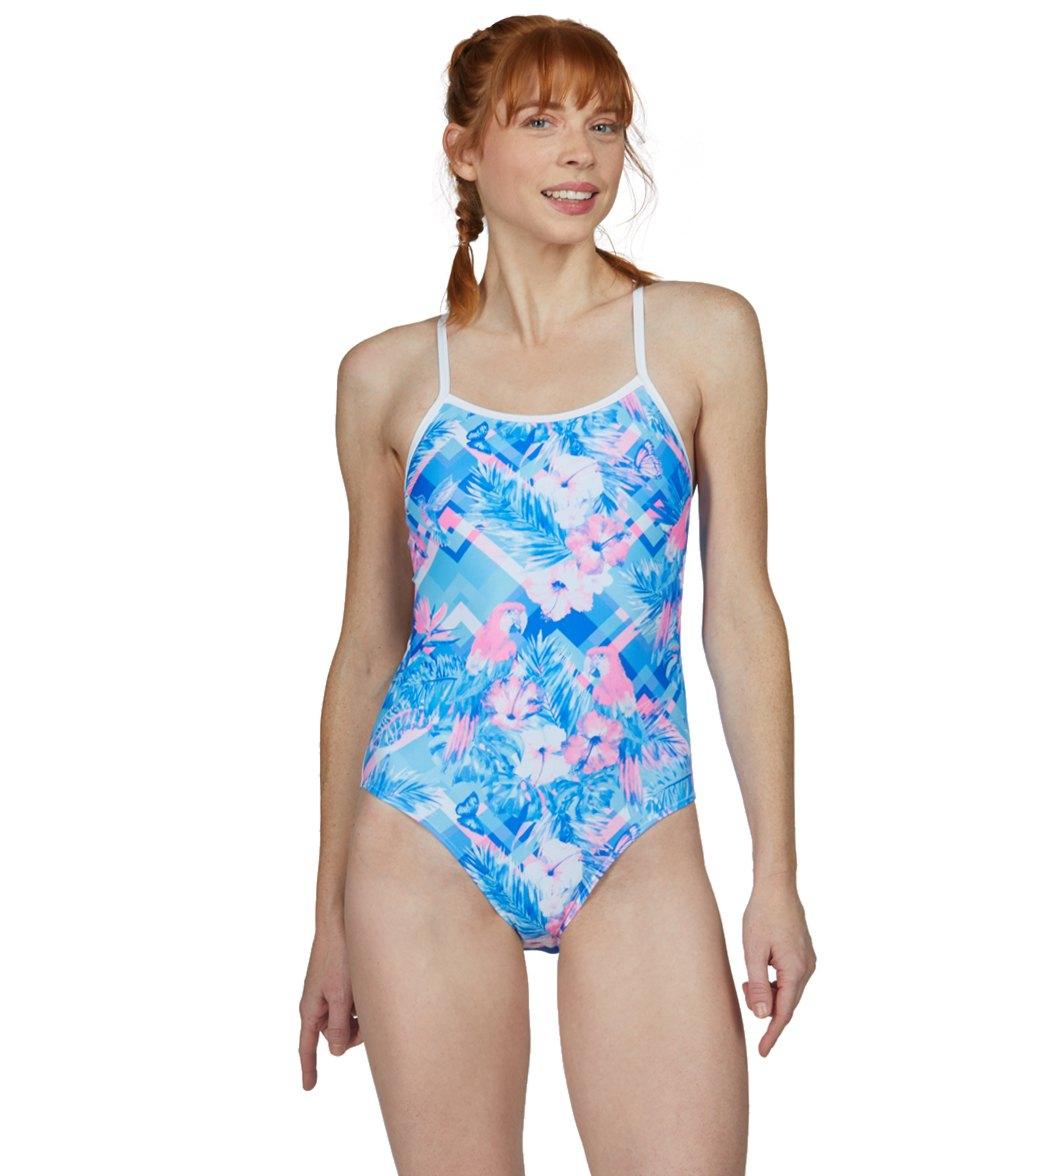 Amanzi Women's Summer Oasis One Piece Swimsuit